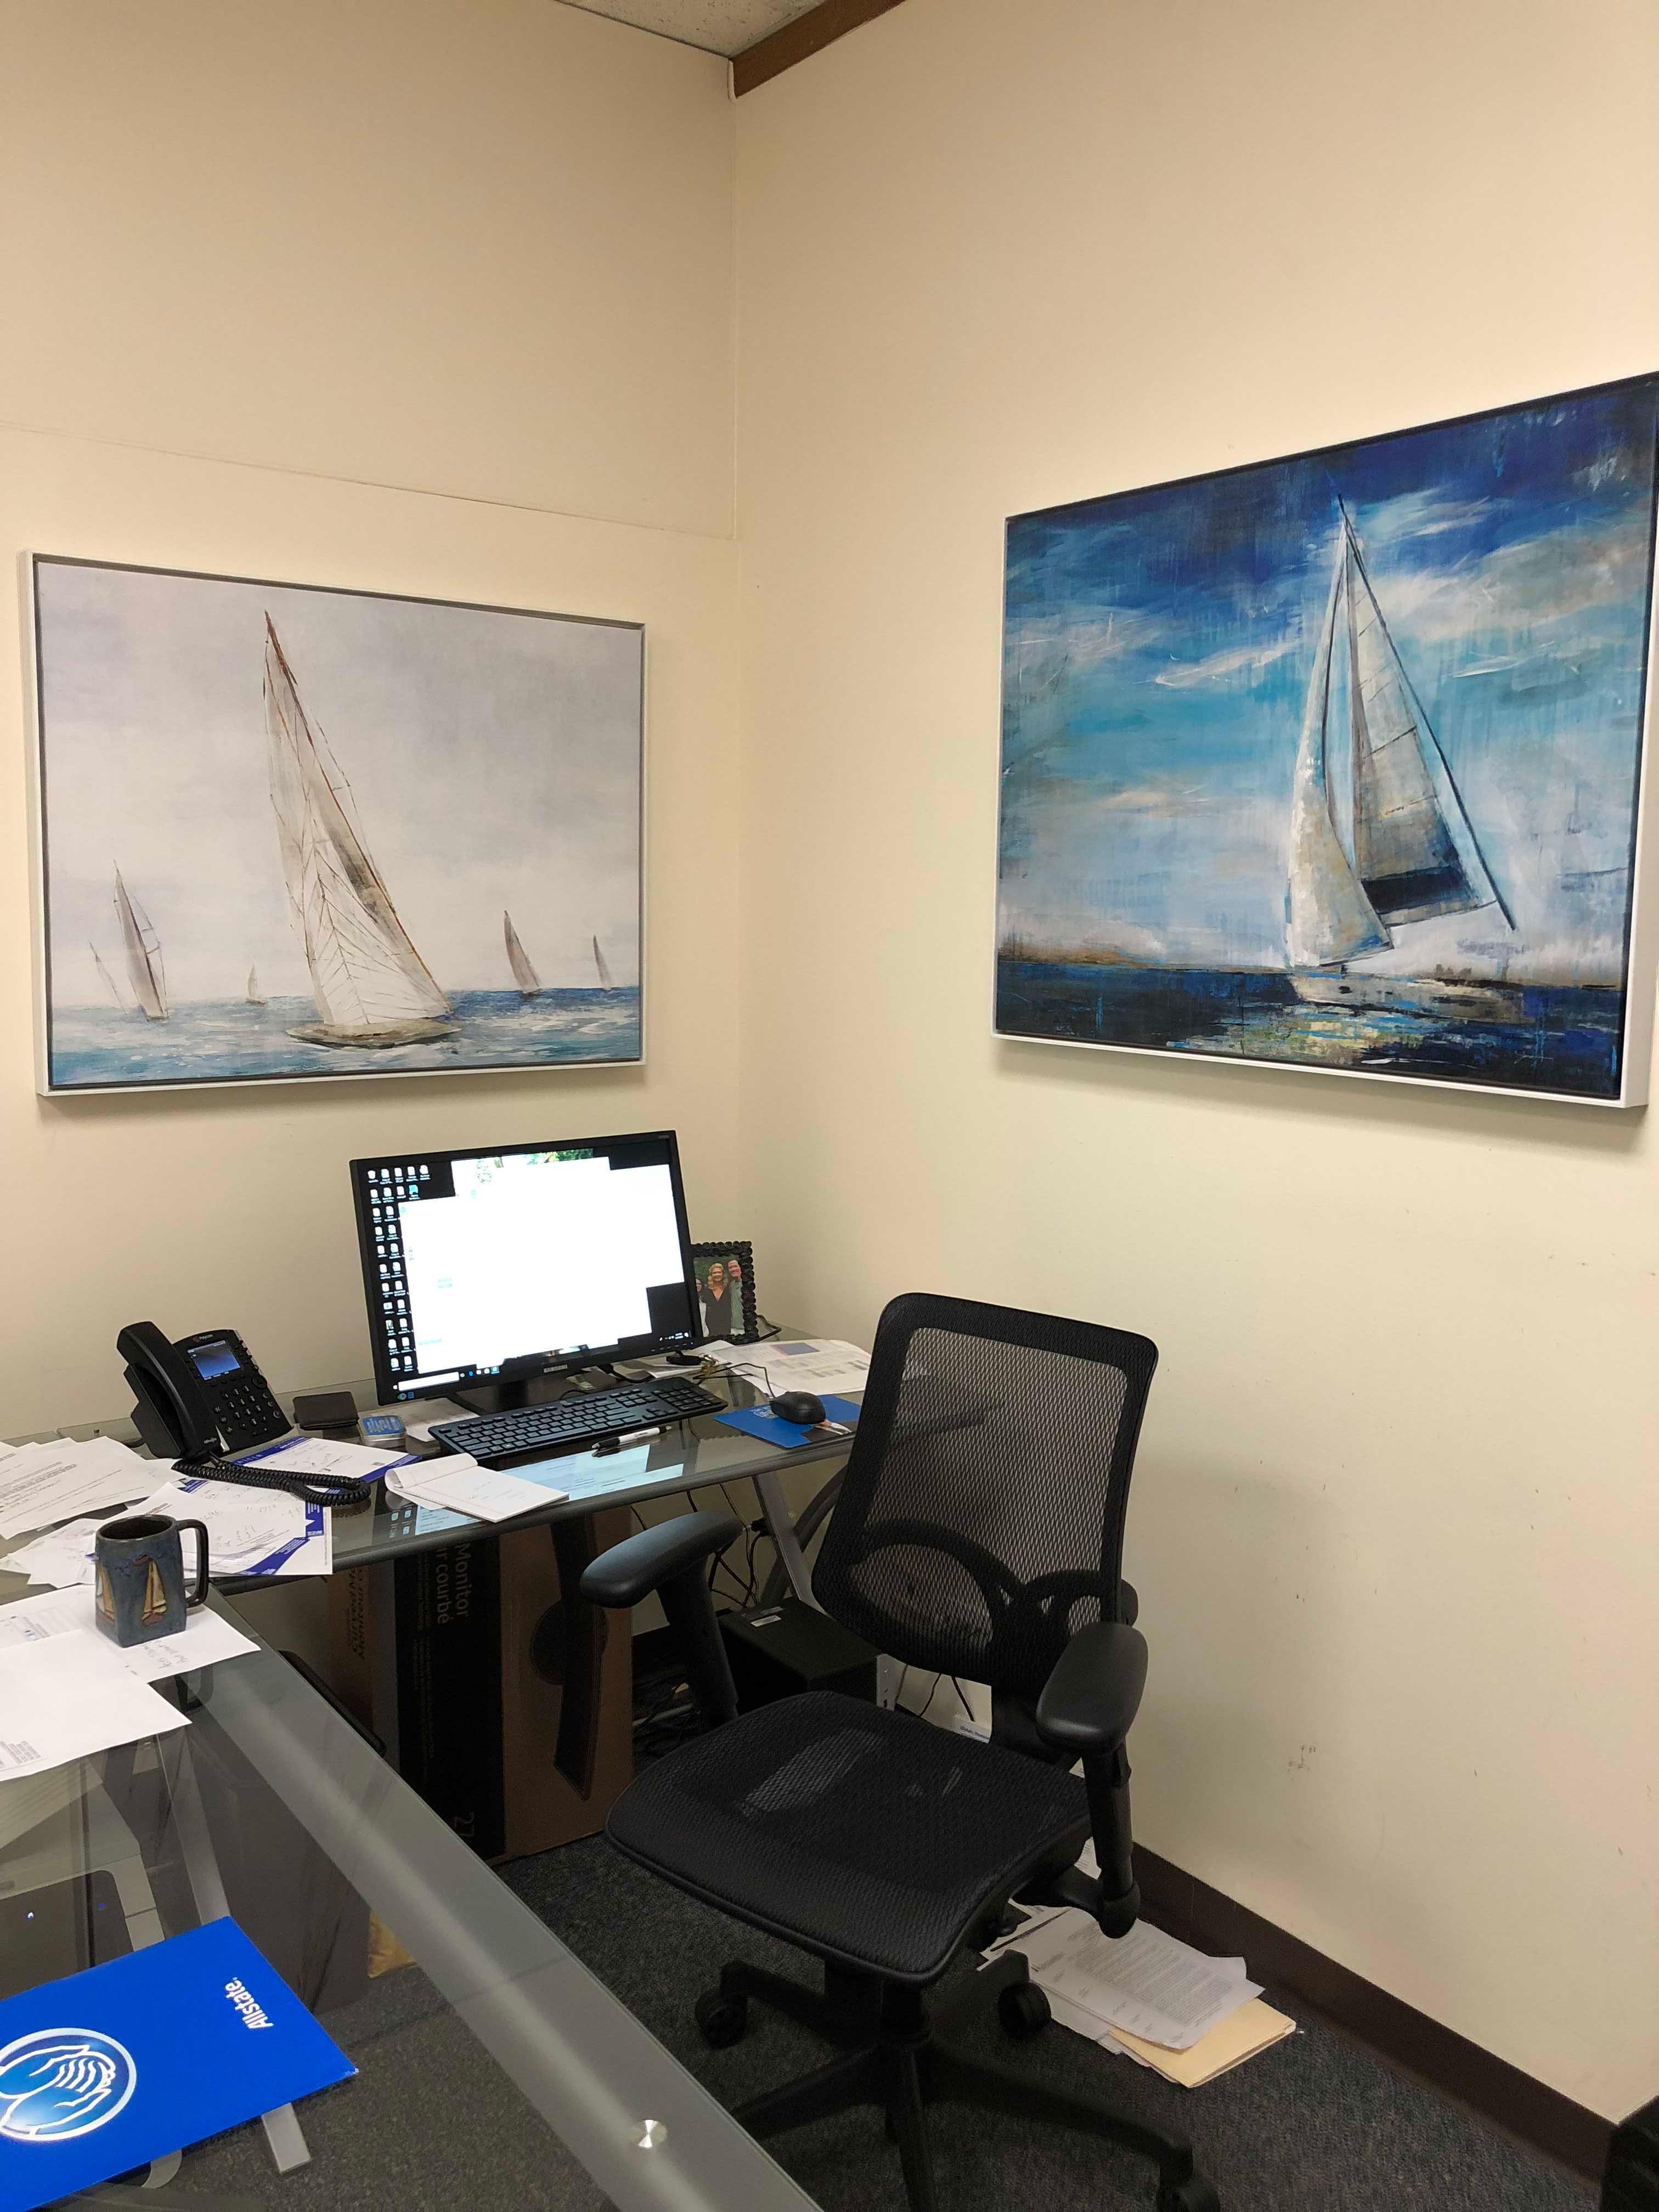 Jason Erickson: Allstate Insurance image 1